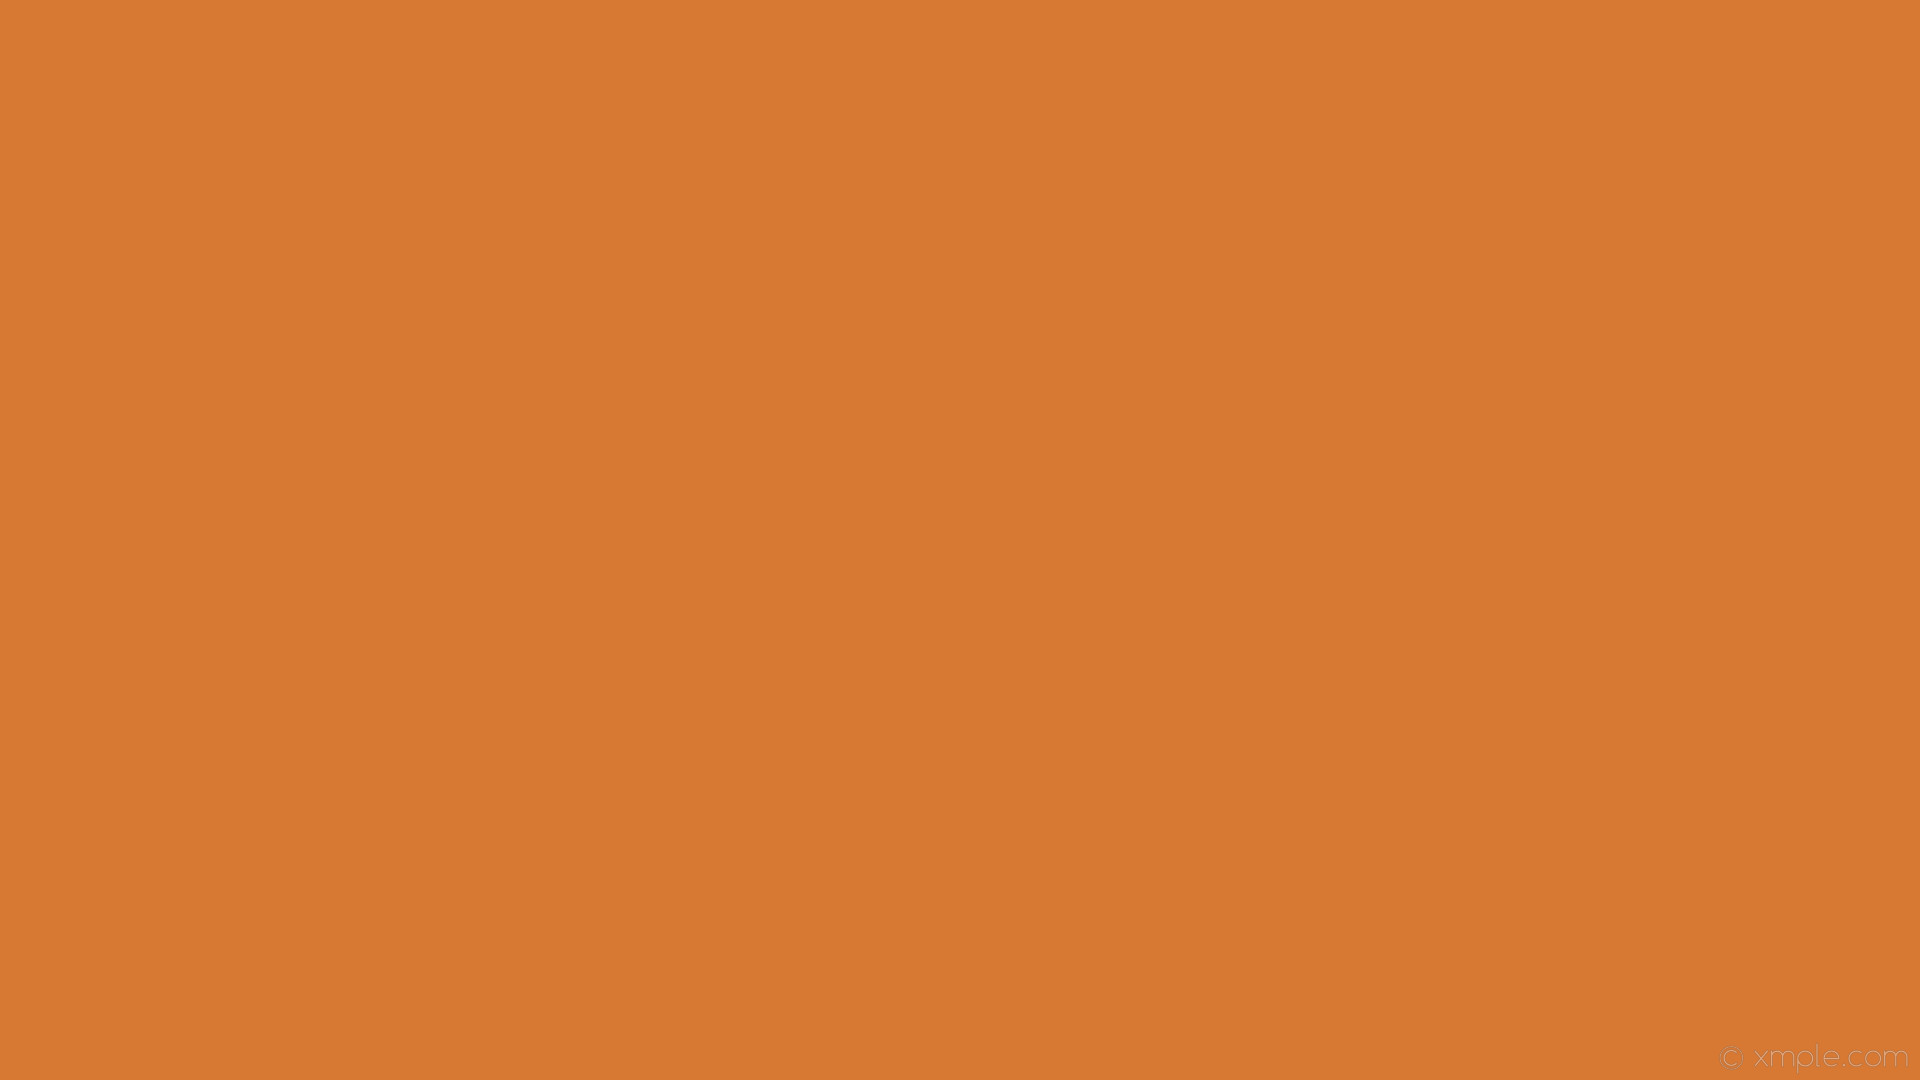 135079 orange colour wallpaper